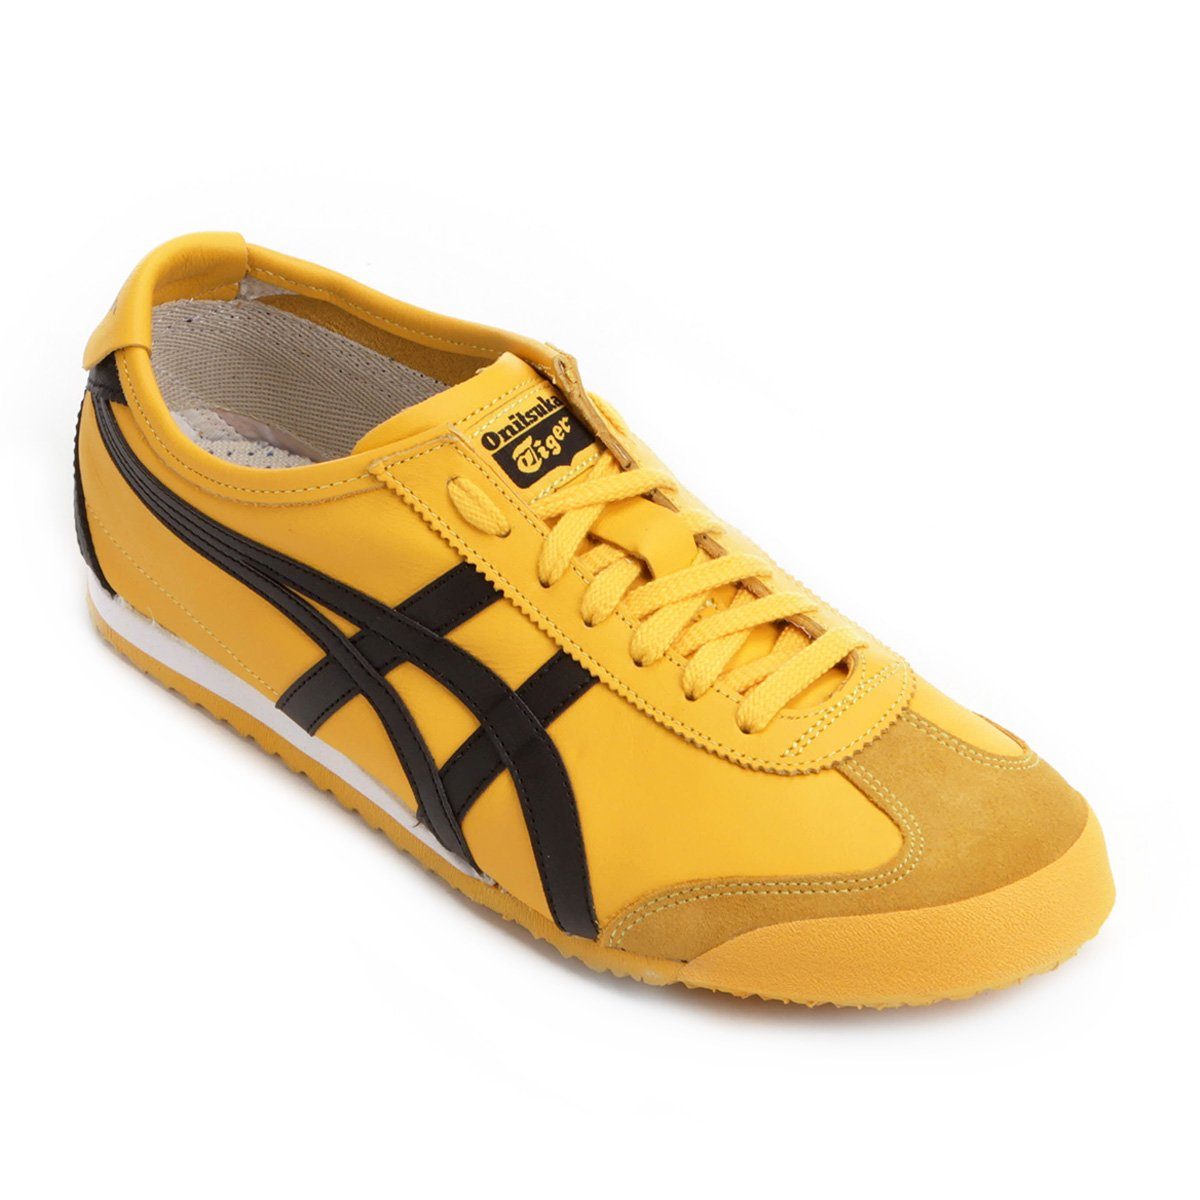 tenis asics onitsuka tiger mexico 66 amarelo online